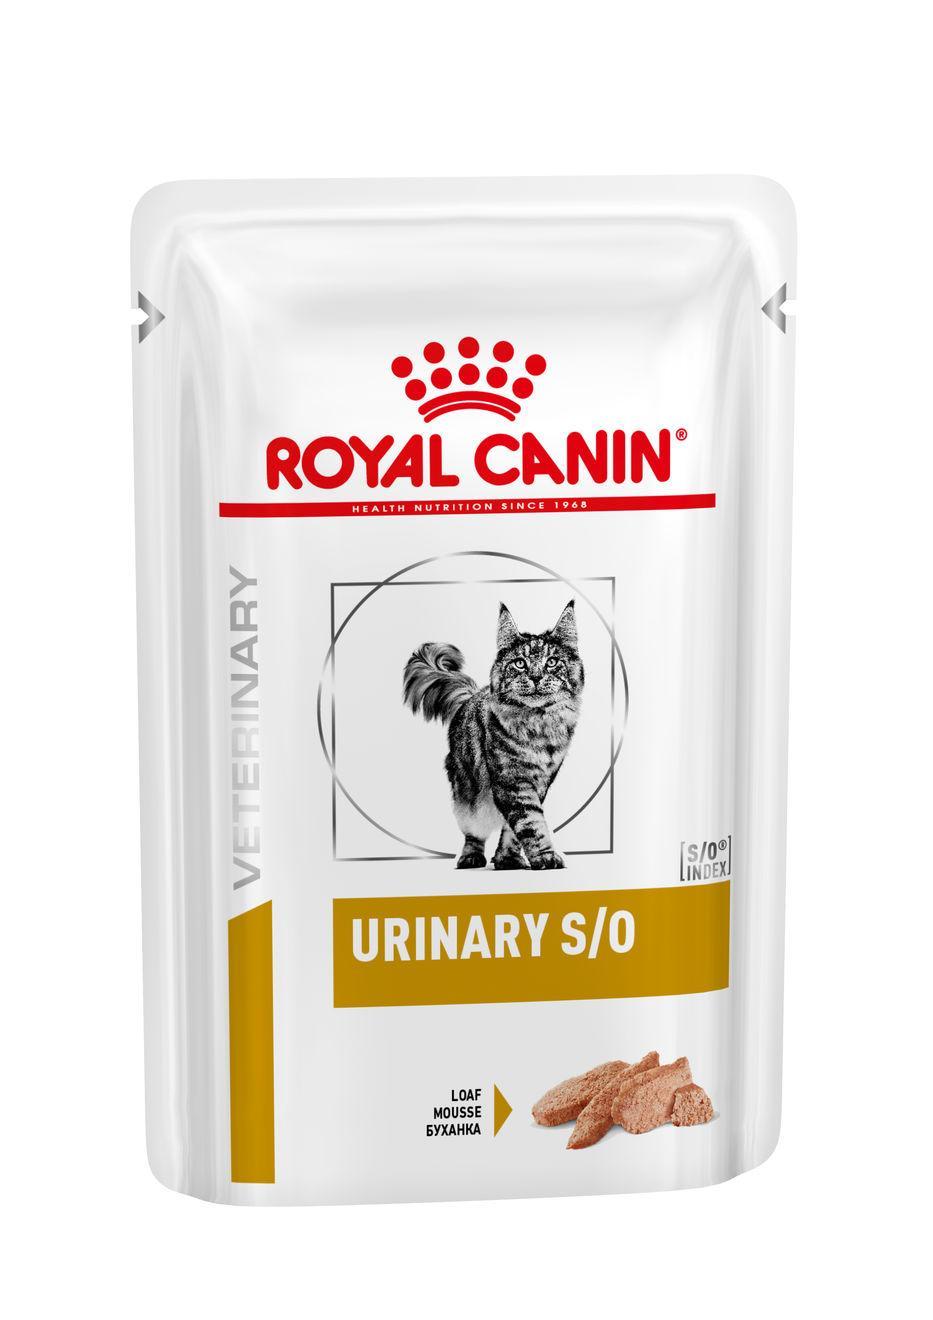 Royal Canin Veterinary Health Nutrition Cat URINARY S/O kapsa in Loaf - 85g